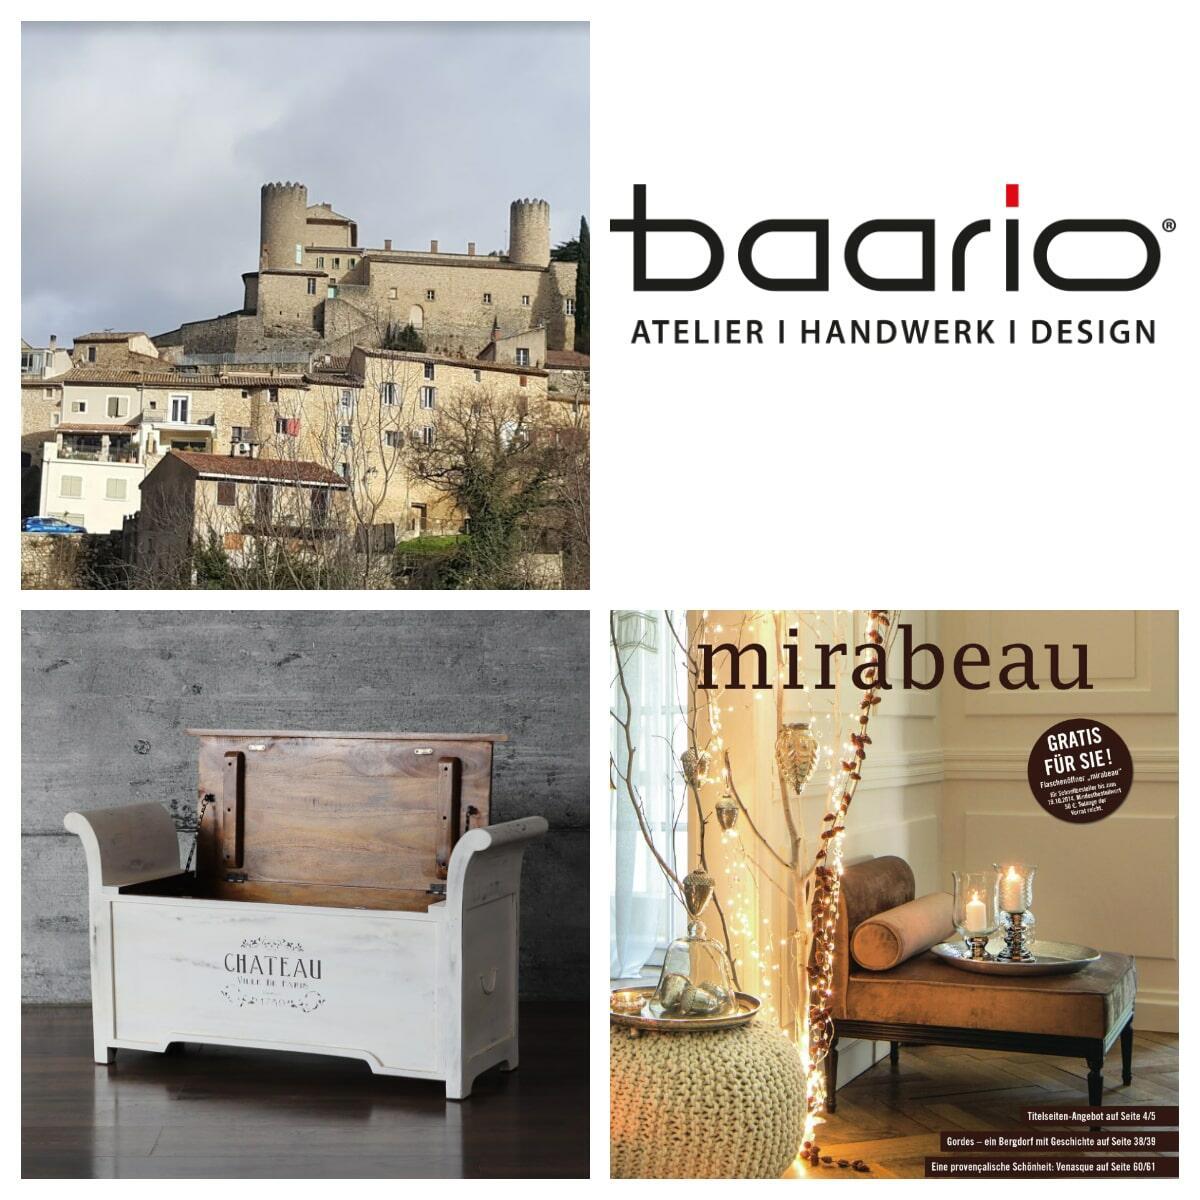 mirabeau-moebel-online-outlet-shop